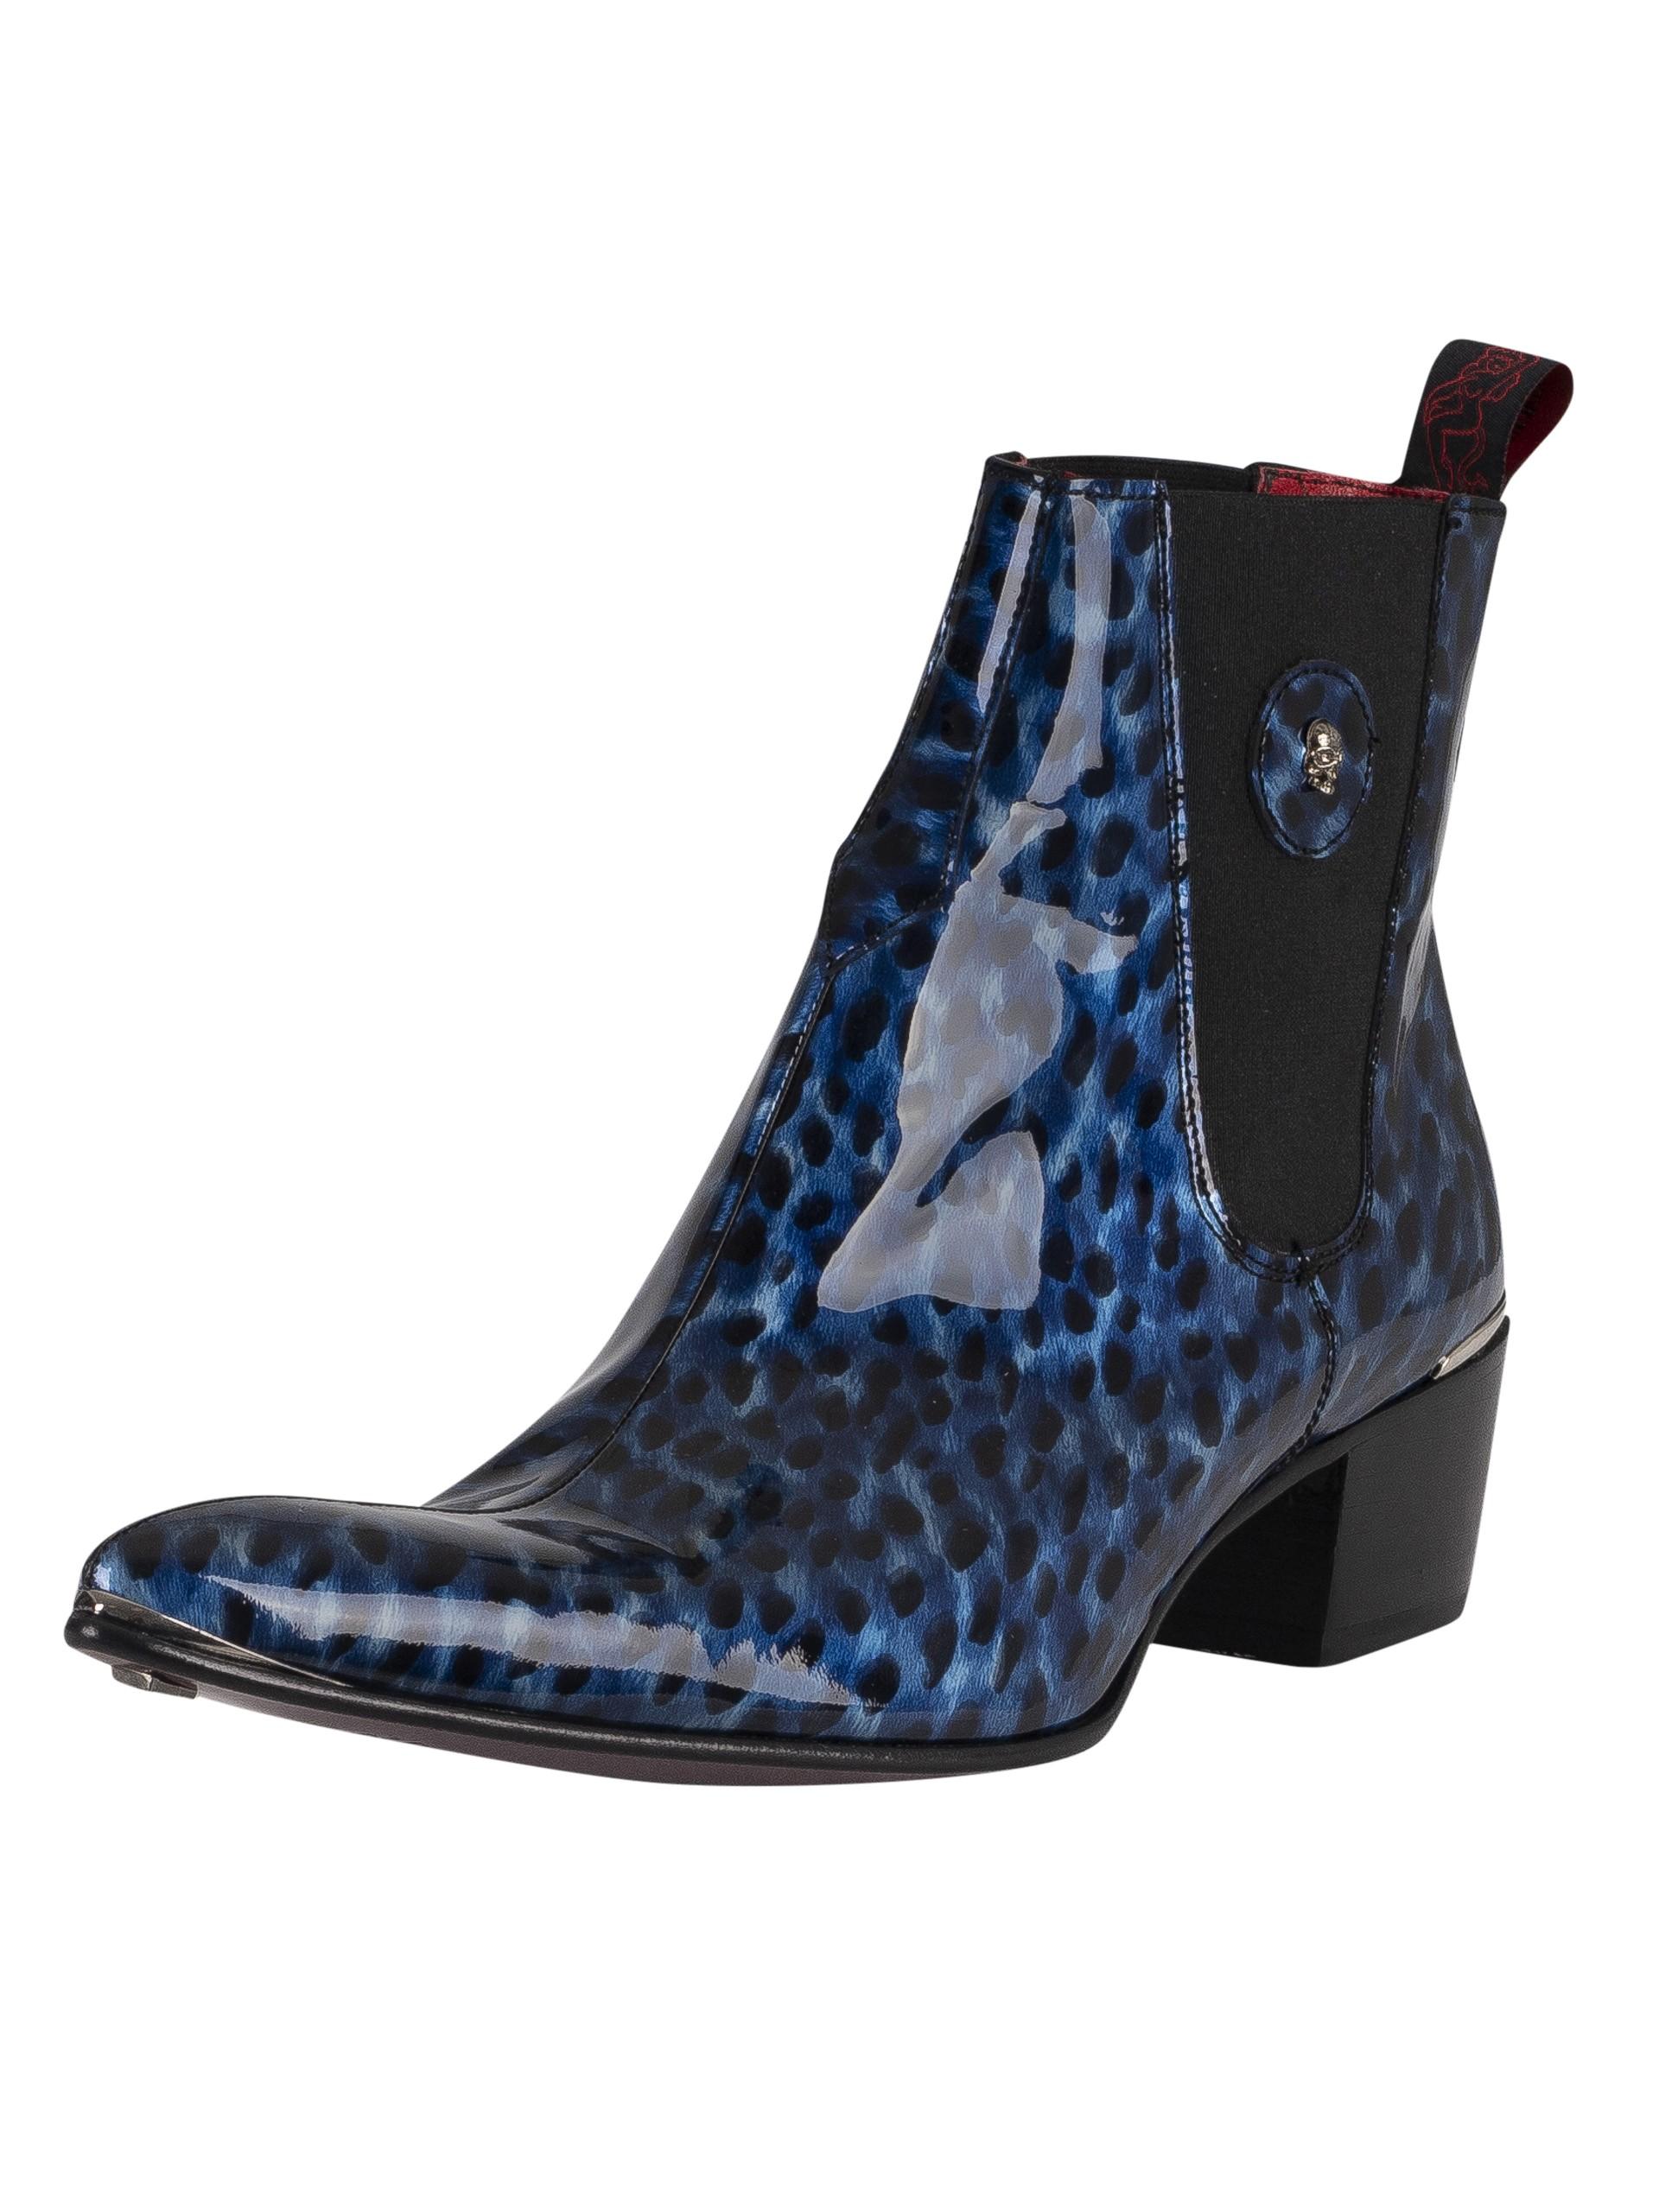 Jeffery West Men/'s Leather Shoes Blue